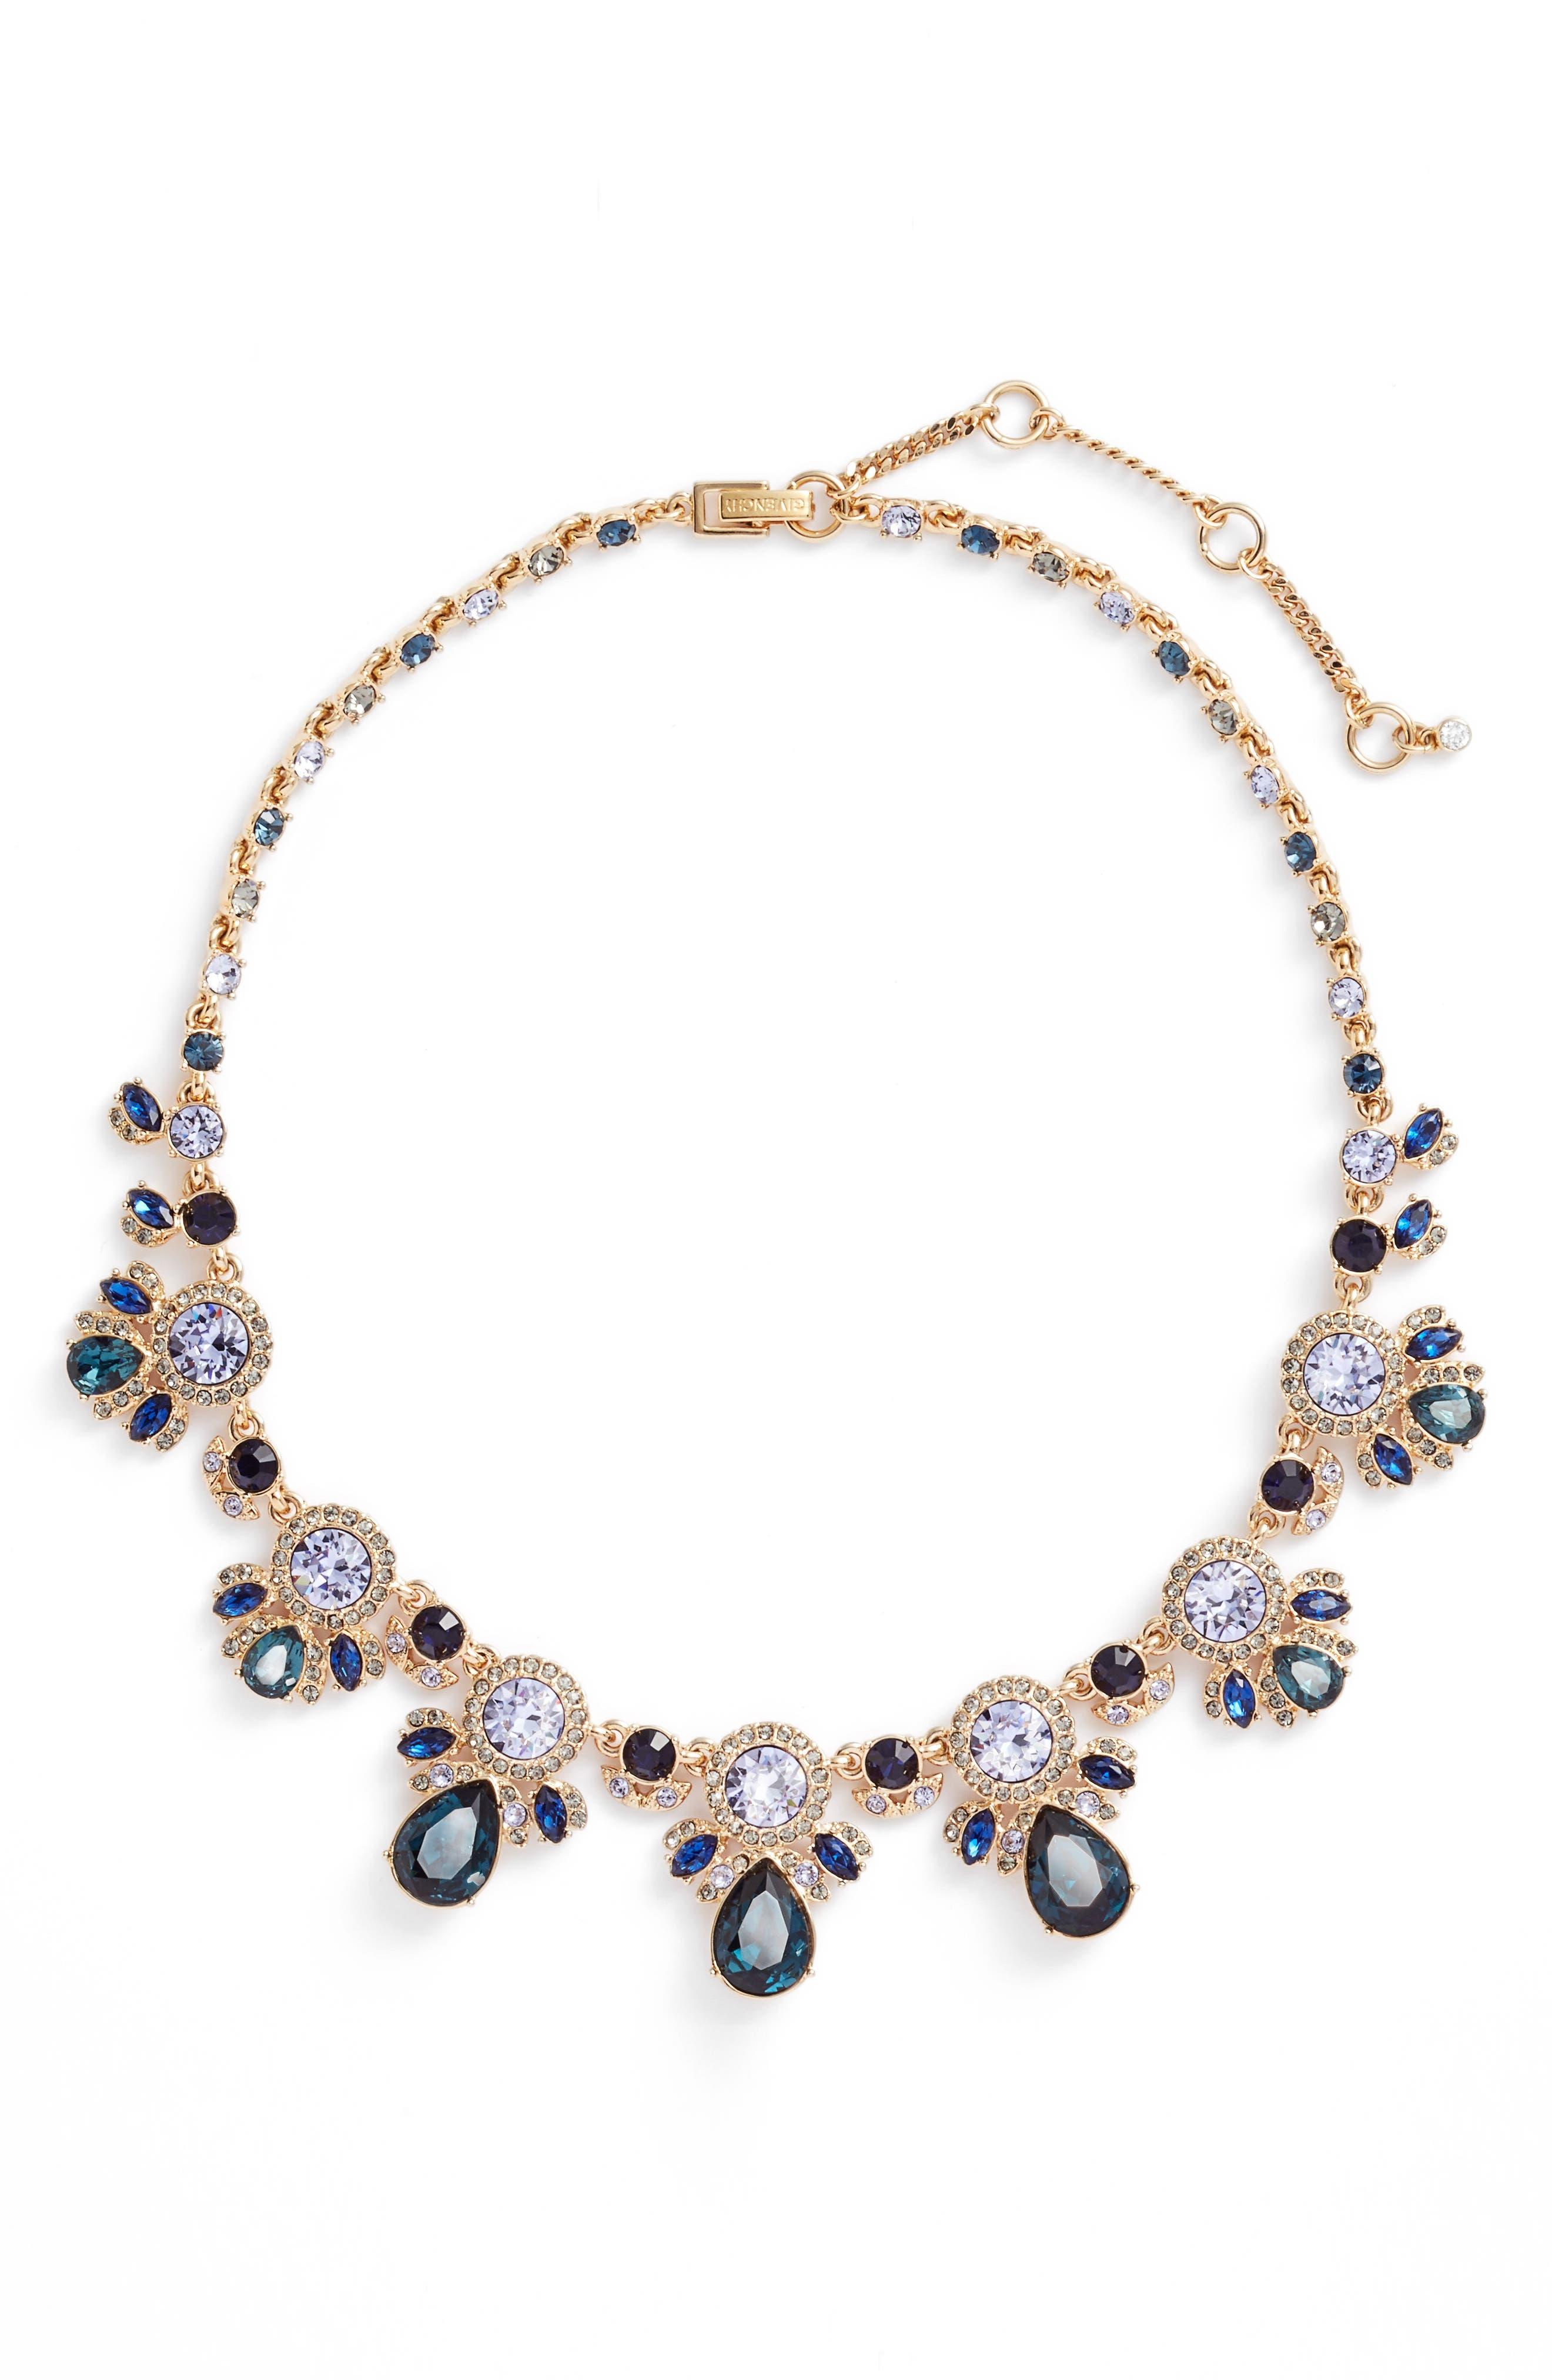 Givenchy Drama Crystal Collar Necklace